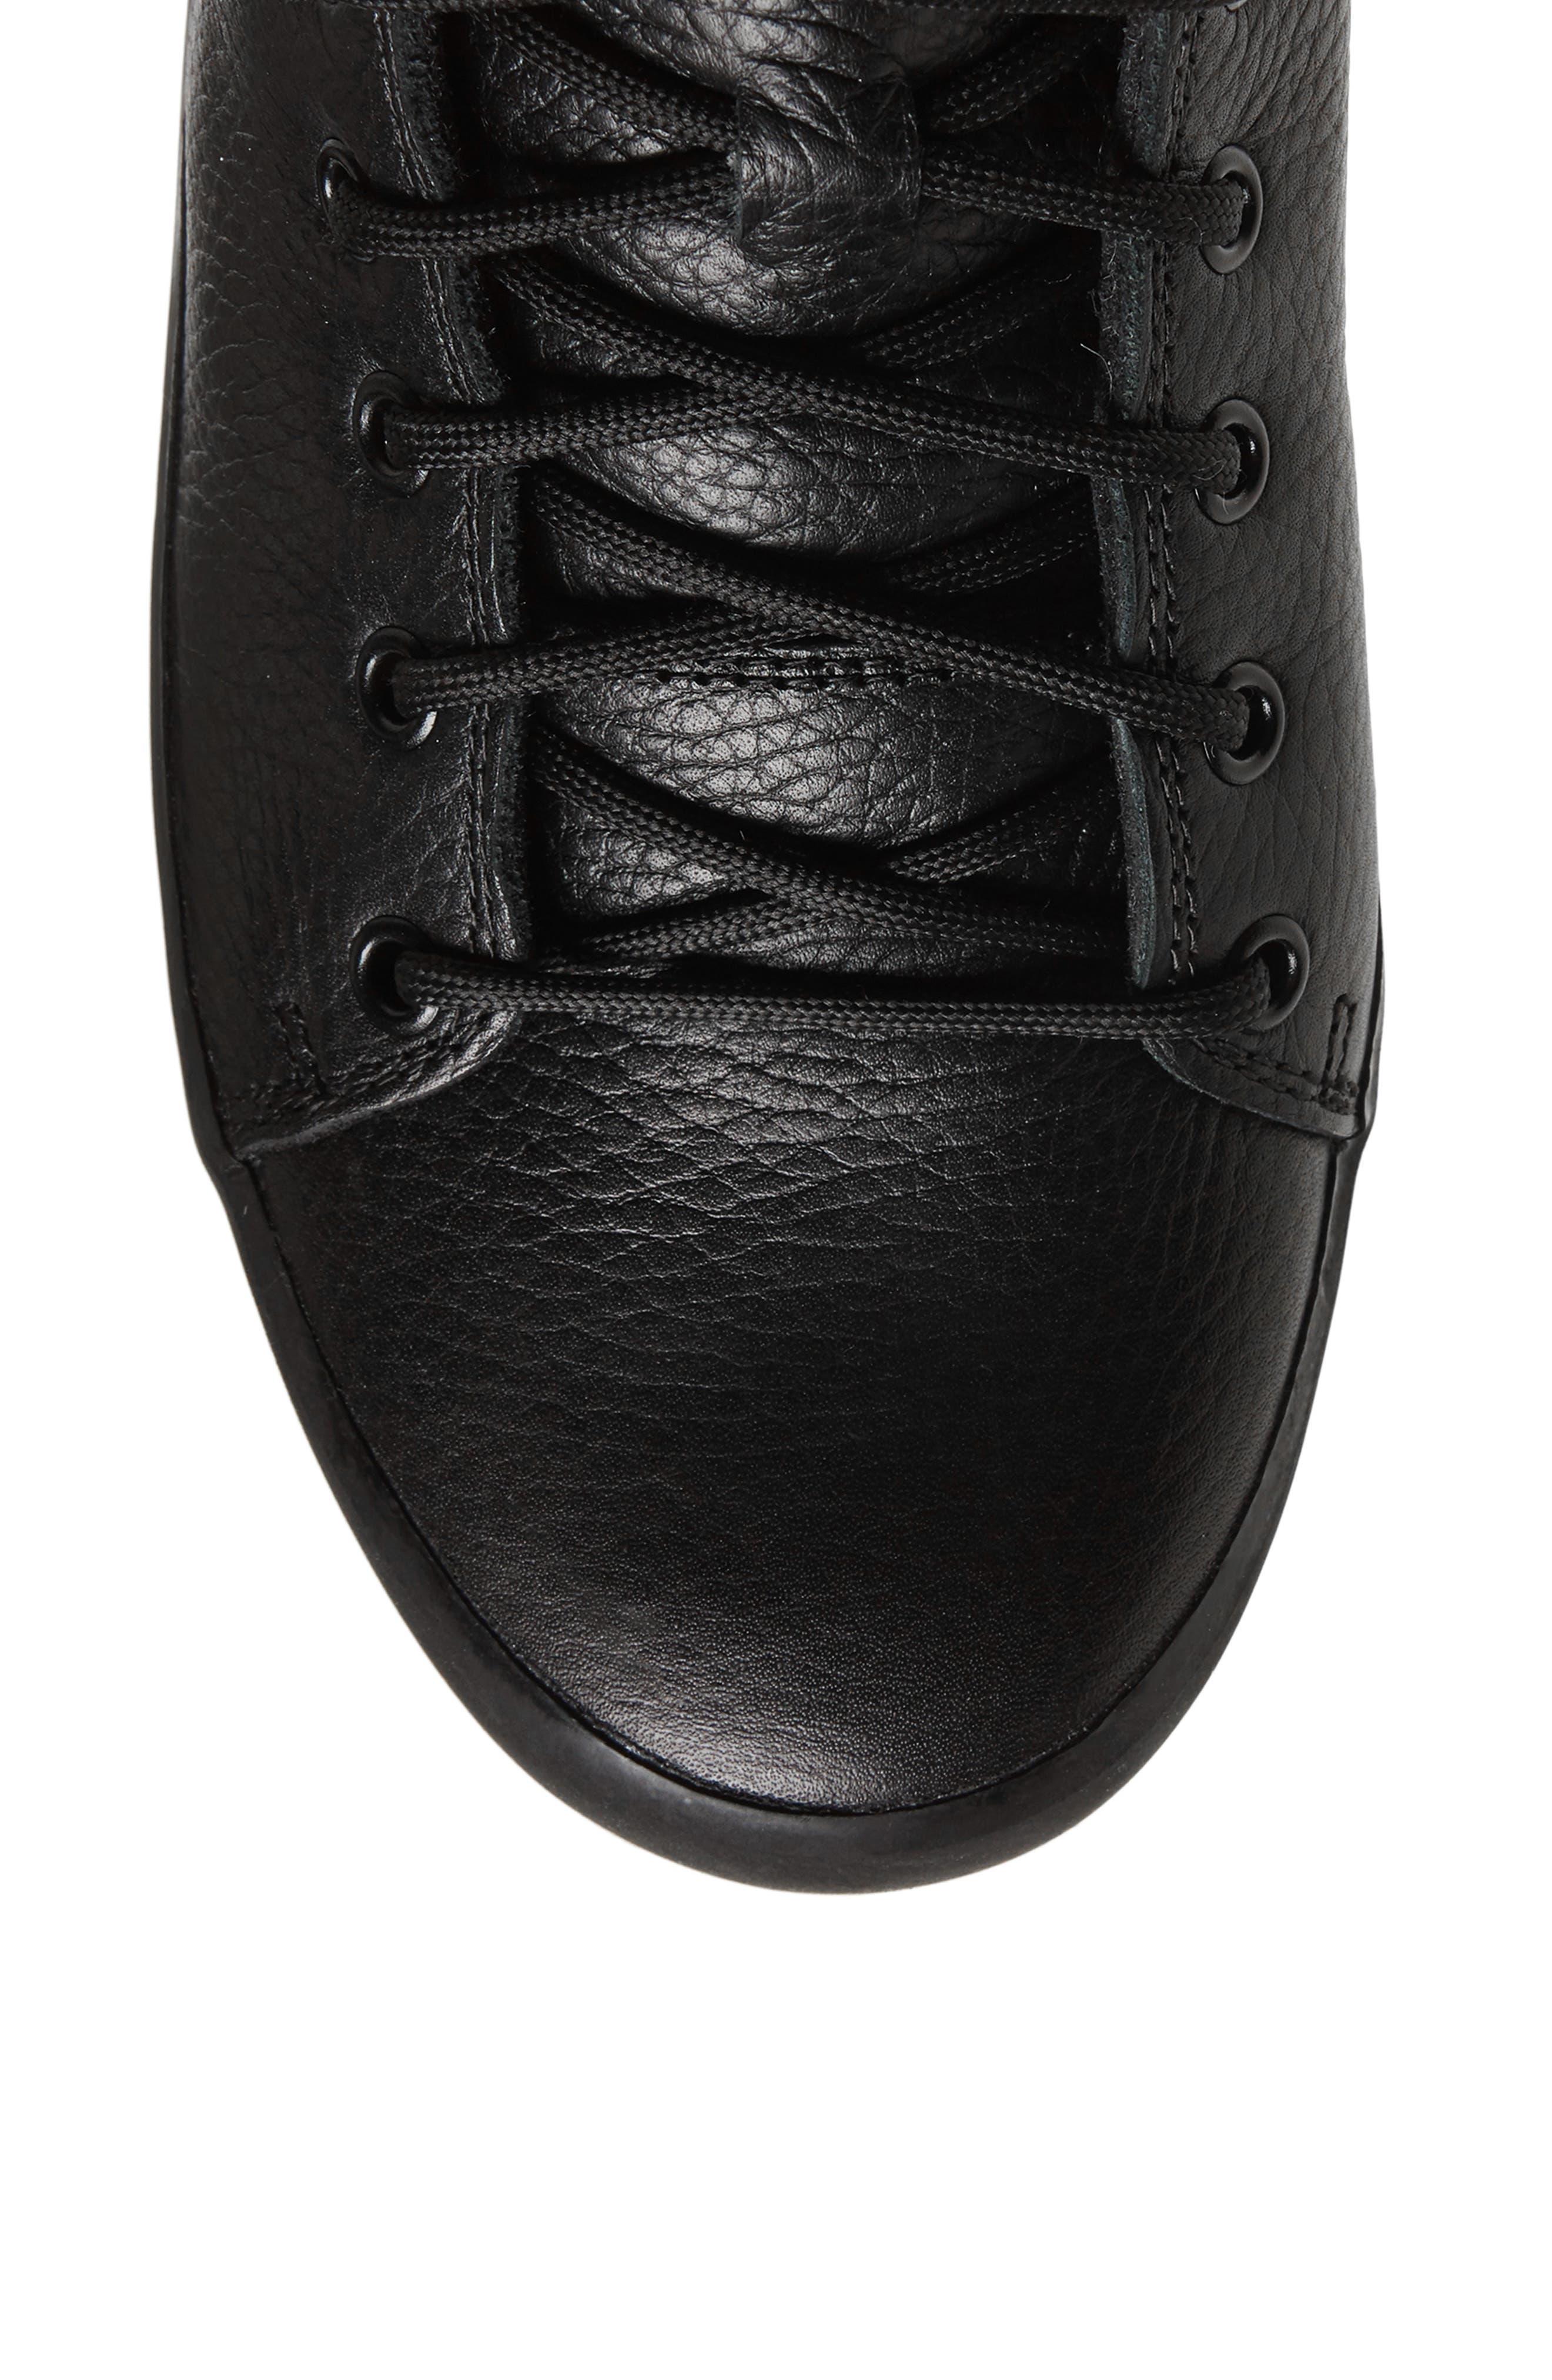 Cryos Boot,                             Alternate thumbnail 5, color,                             TNF BLACK/ GLACIER WHITE